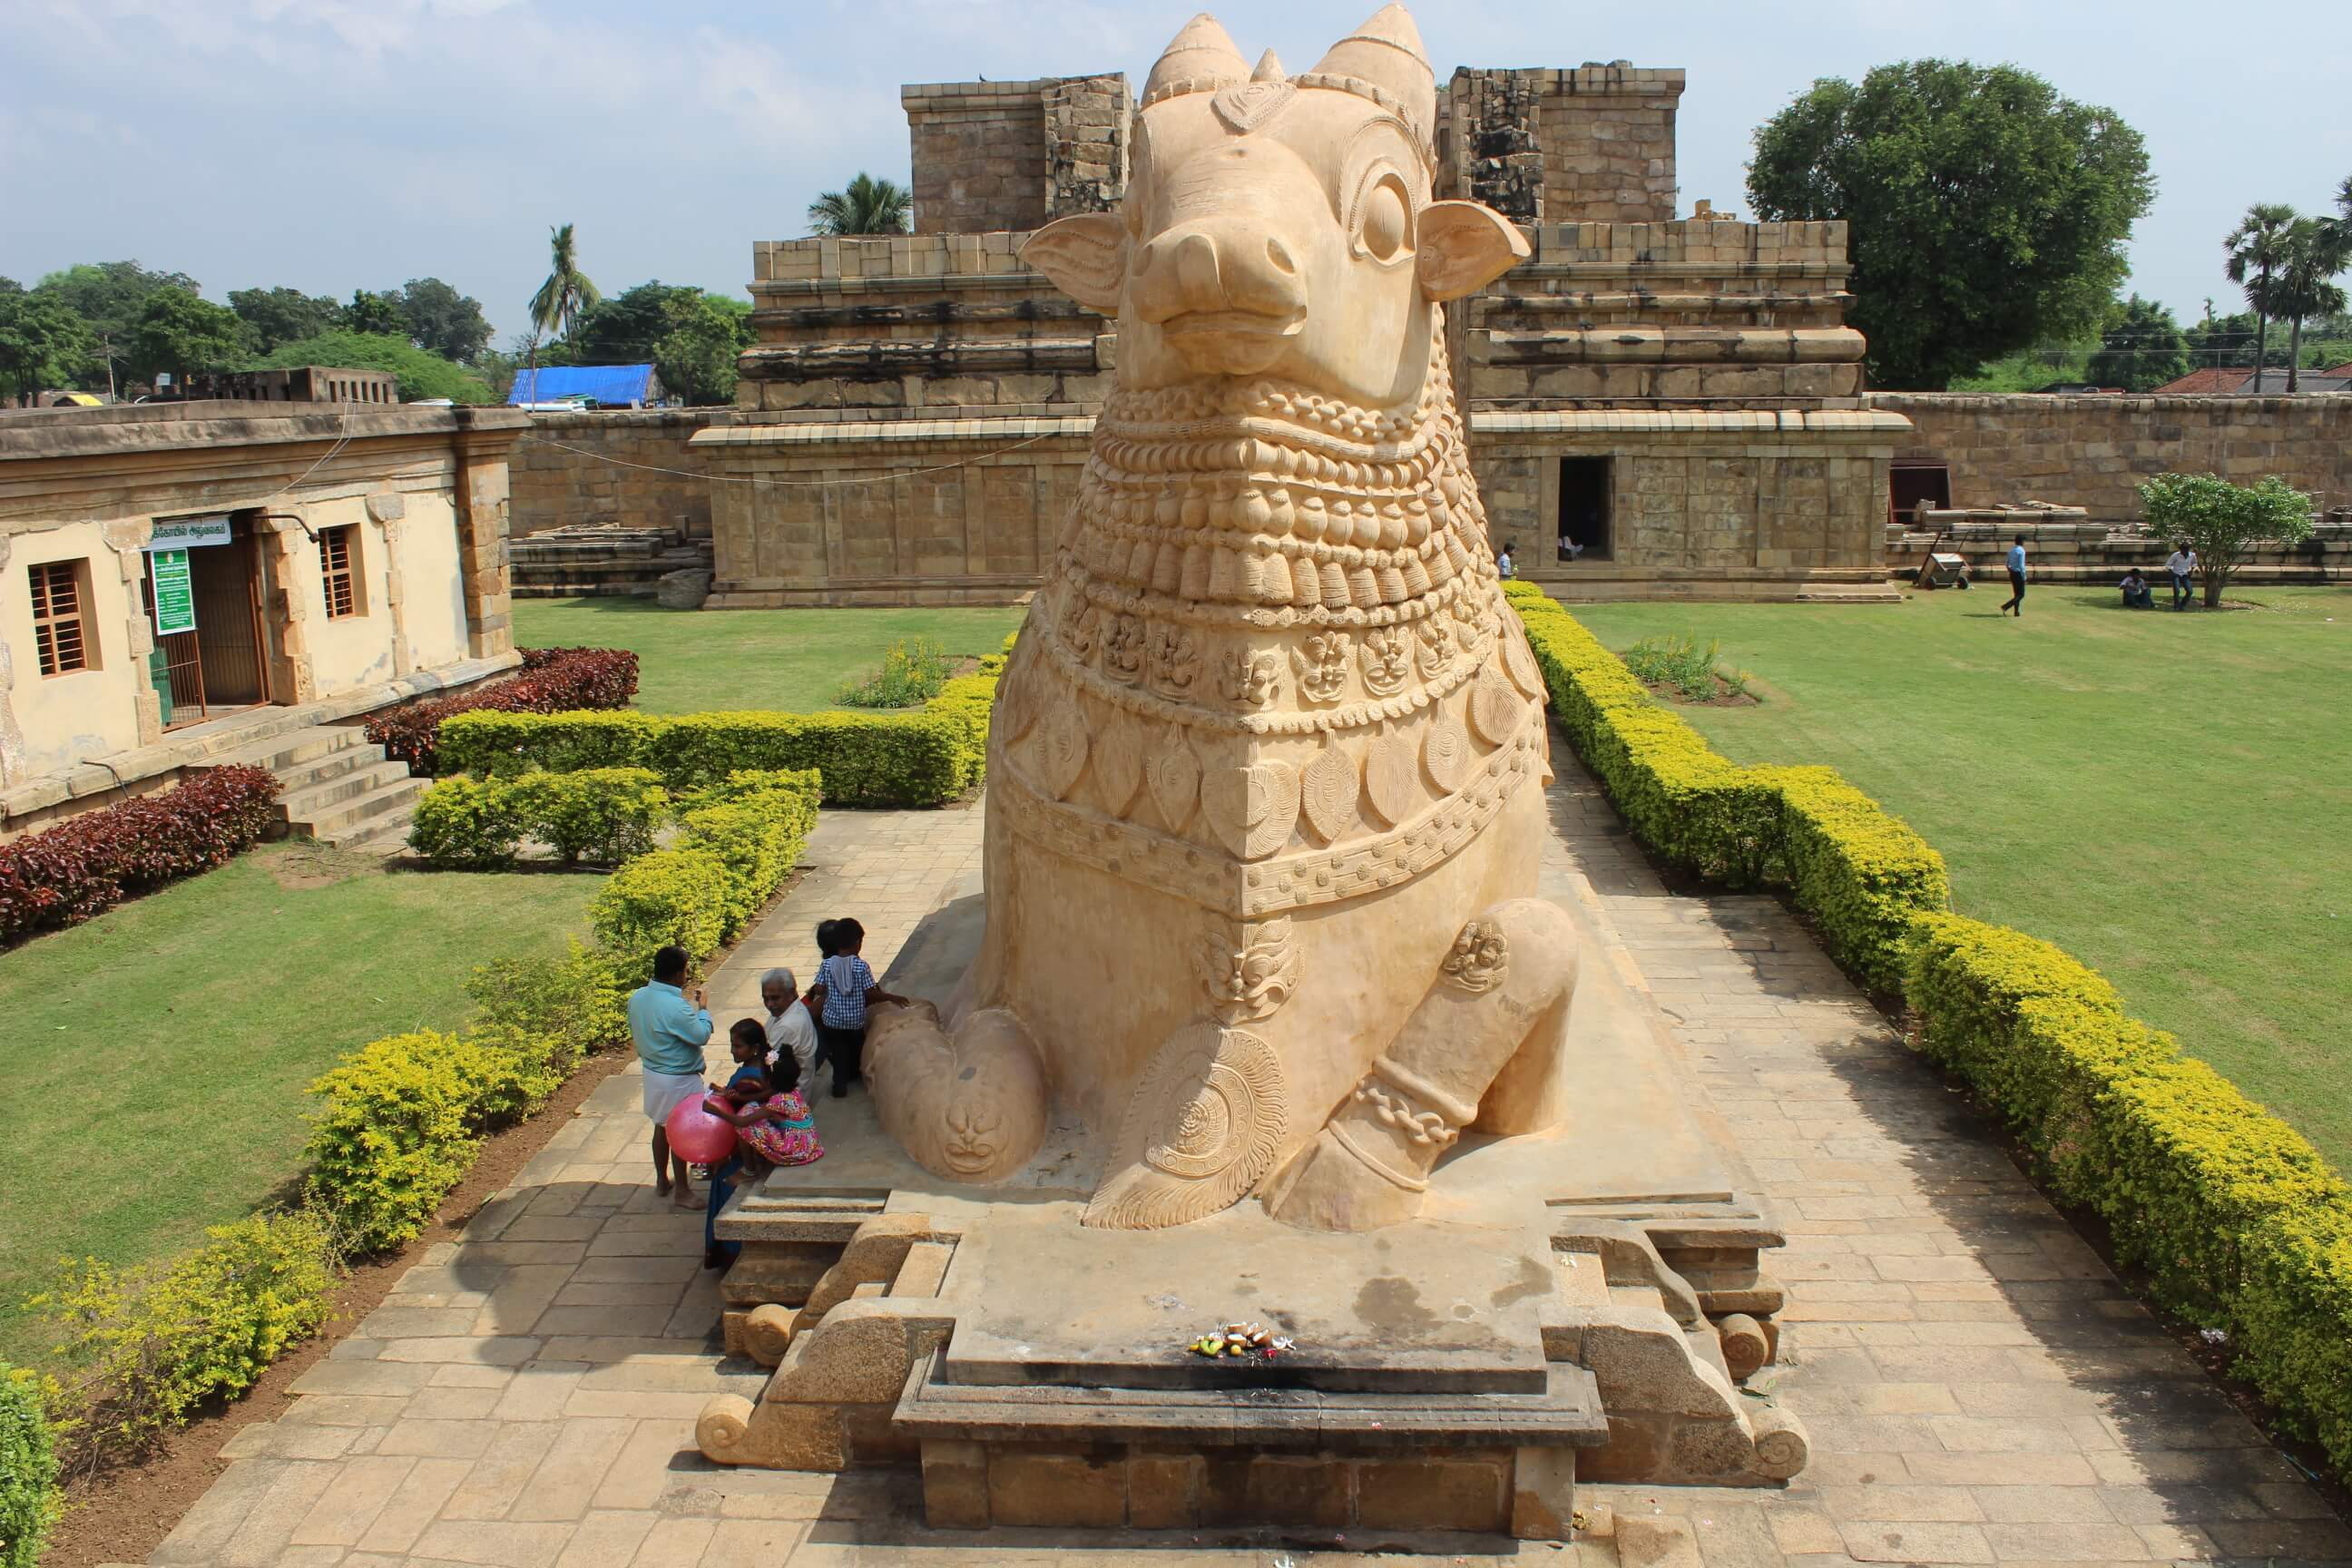 Representation of Nandi (Bull) in Ancient Shivan Temple at Gangai konda Cholapuram